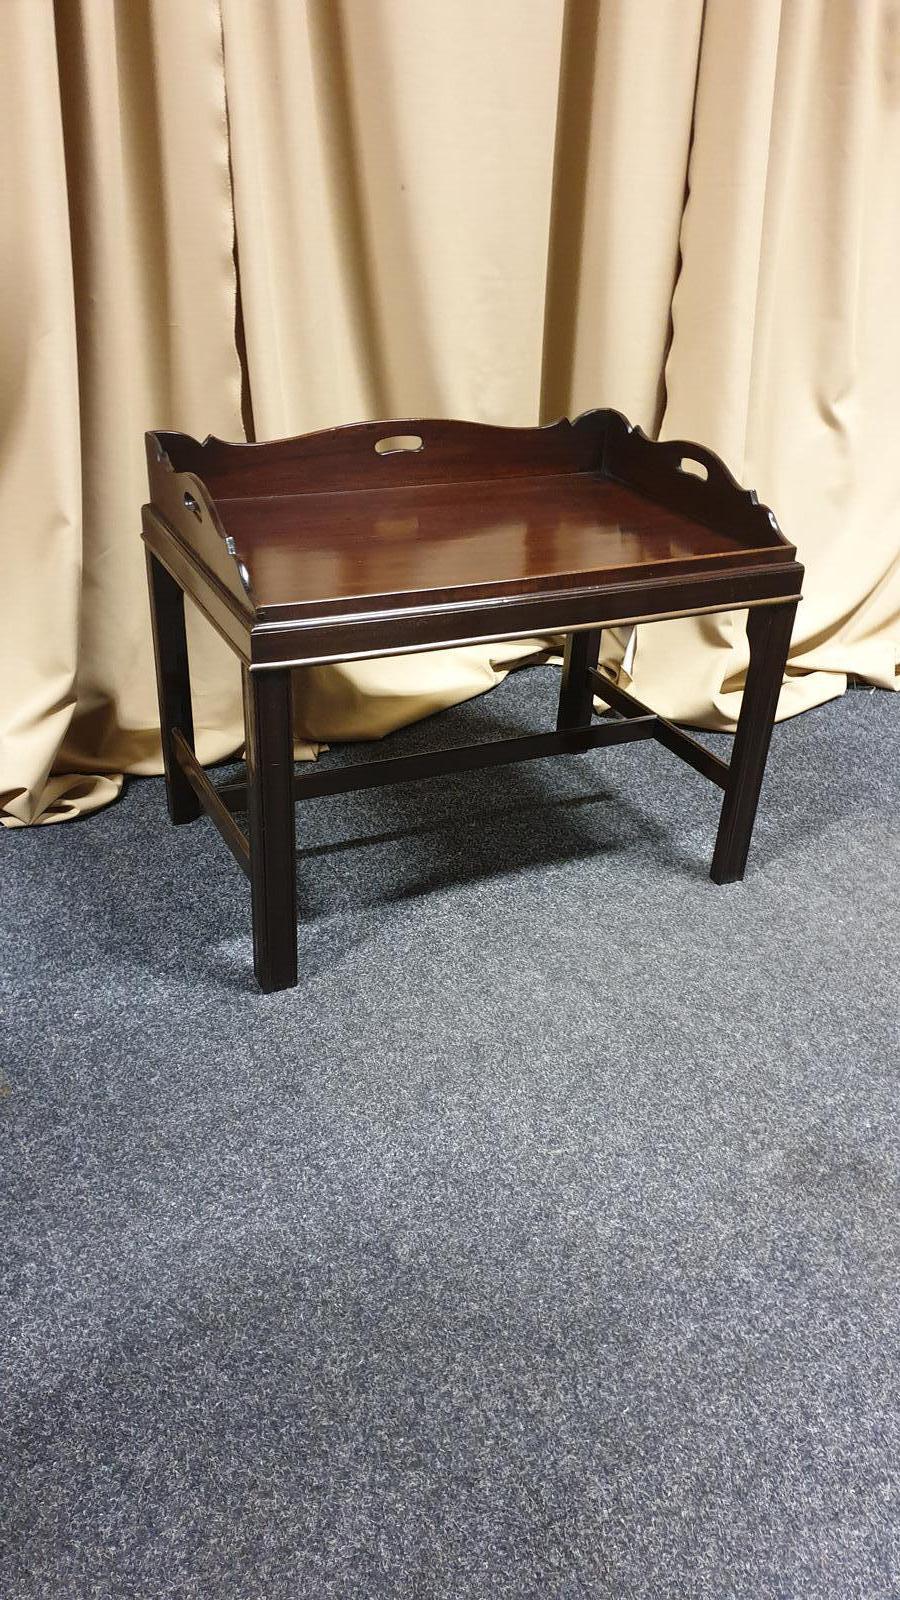 Georgian Mahogany Butlers Tray Coffee Table (1 of 1)